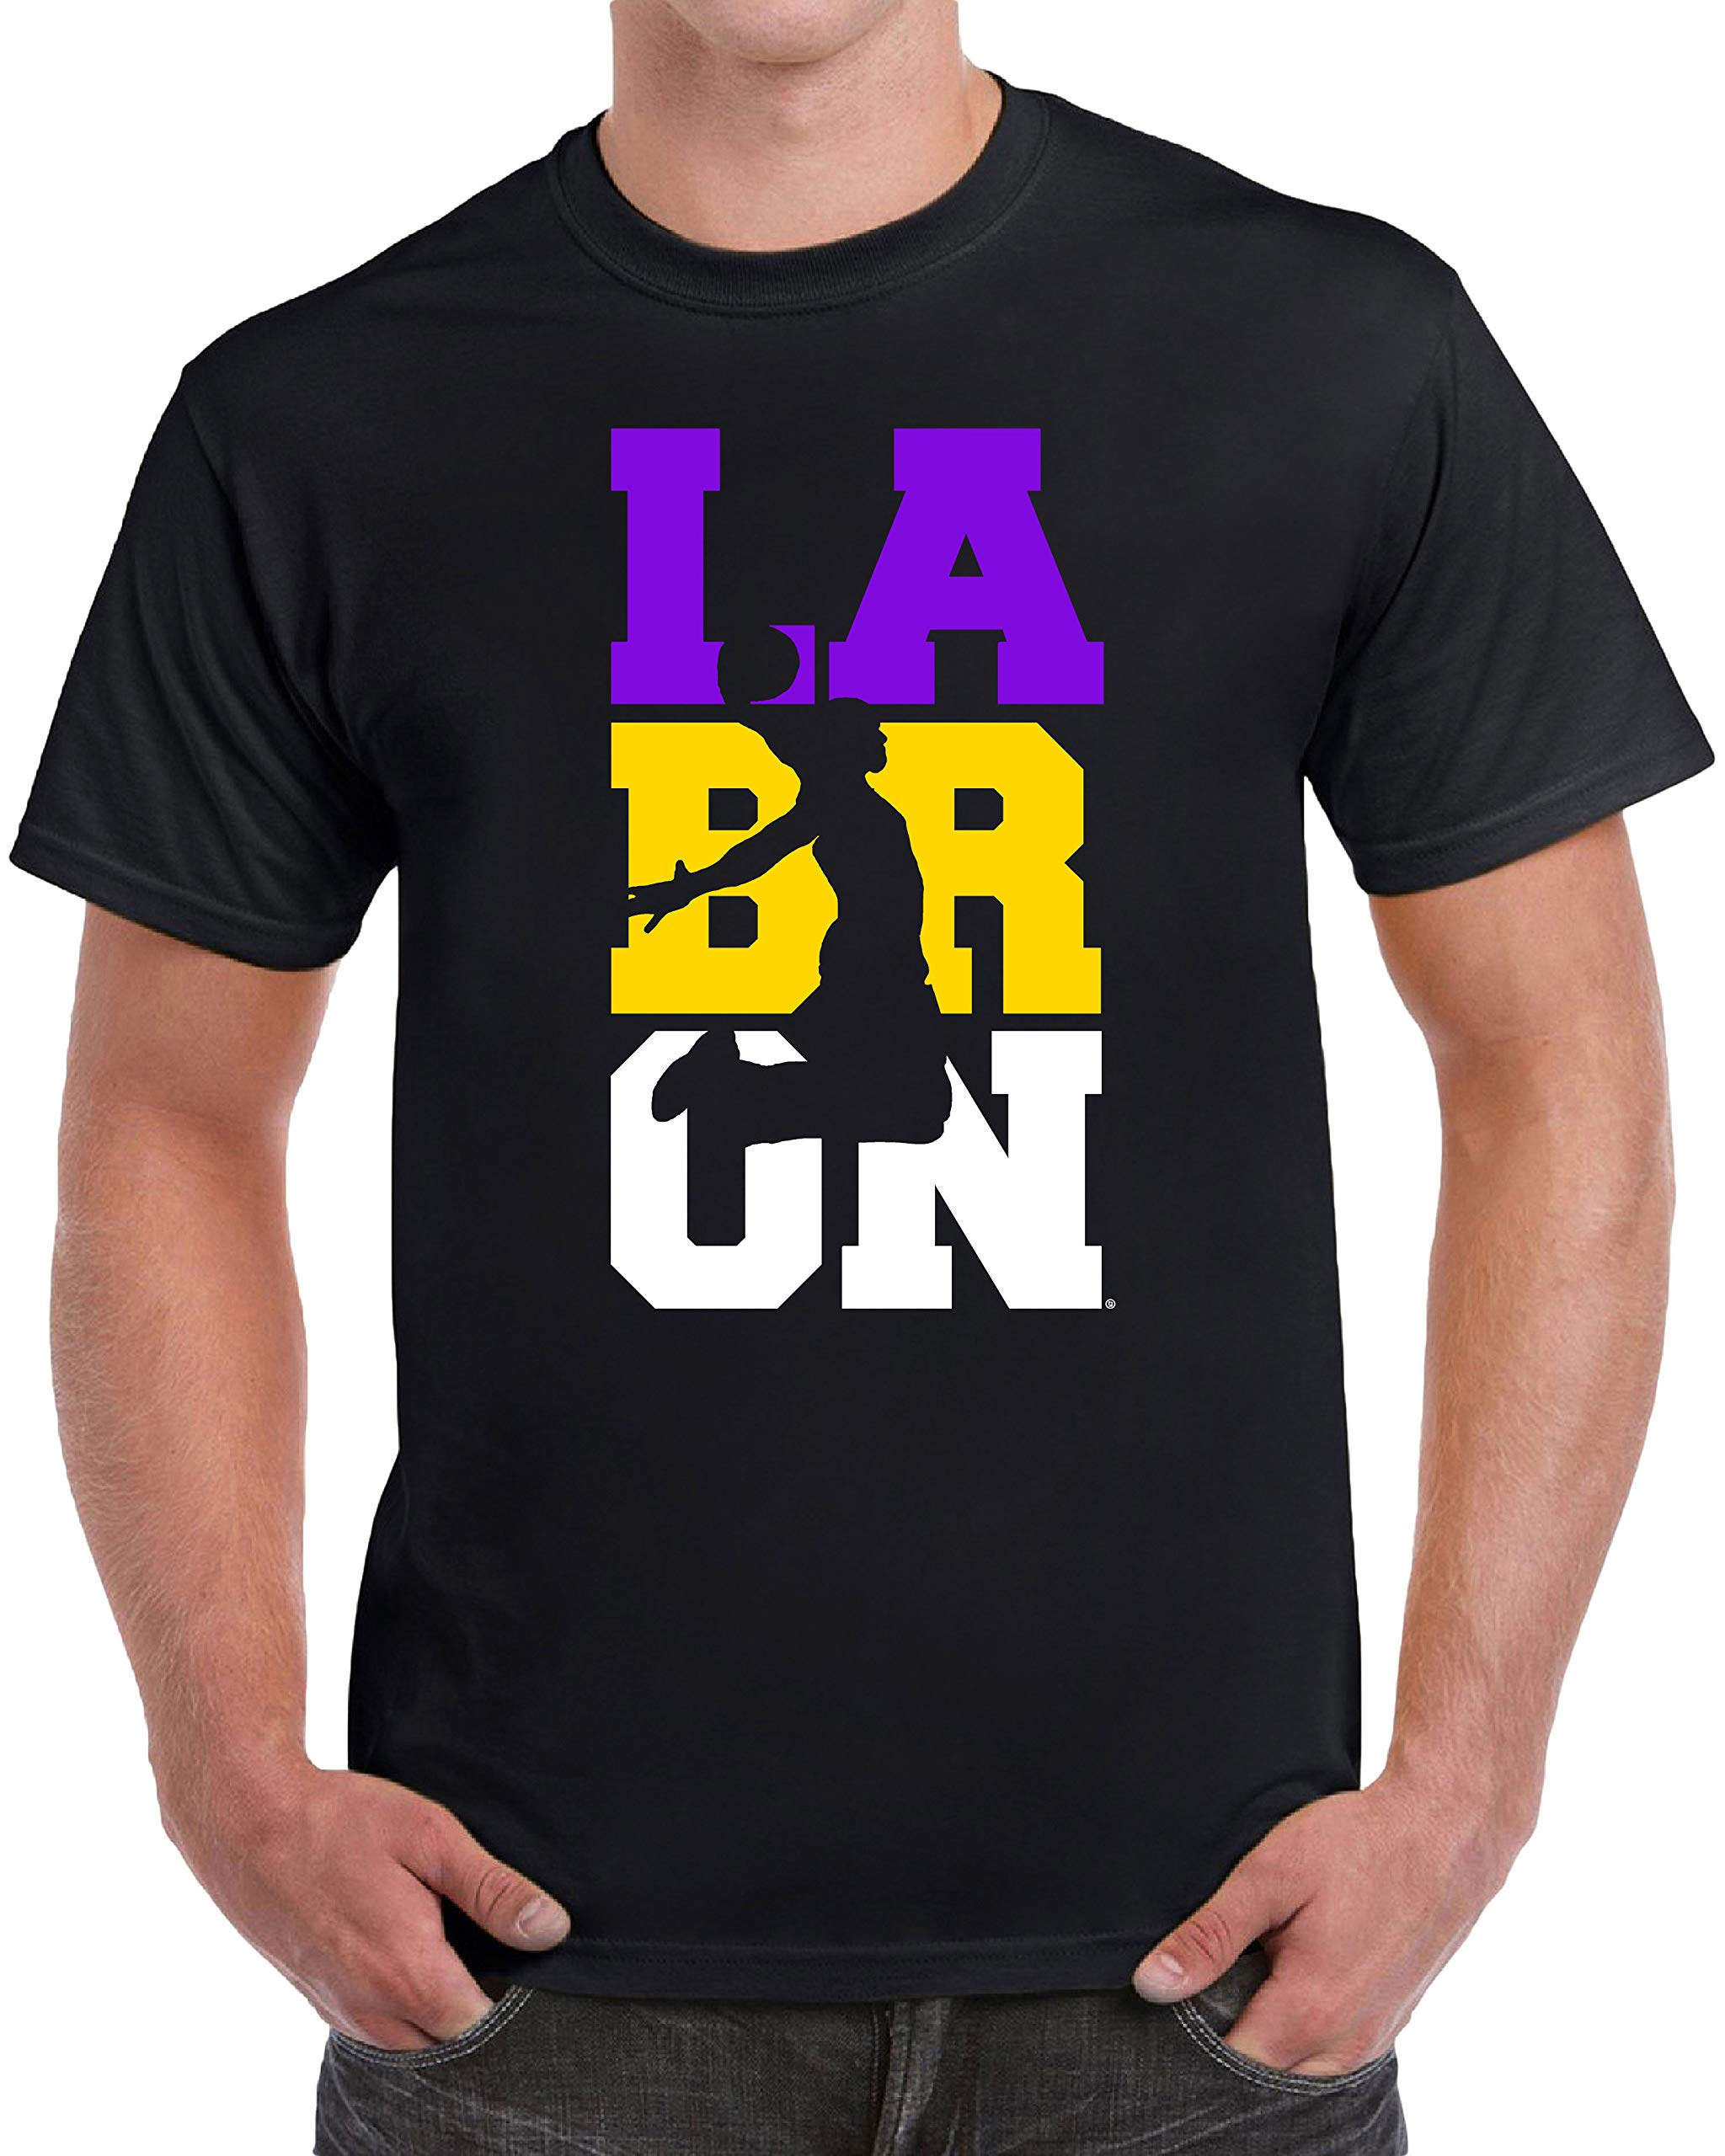 tees geek LaBRON Basketball Men's T-Shirt - (Small) - Black by tees geek